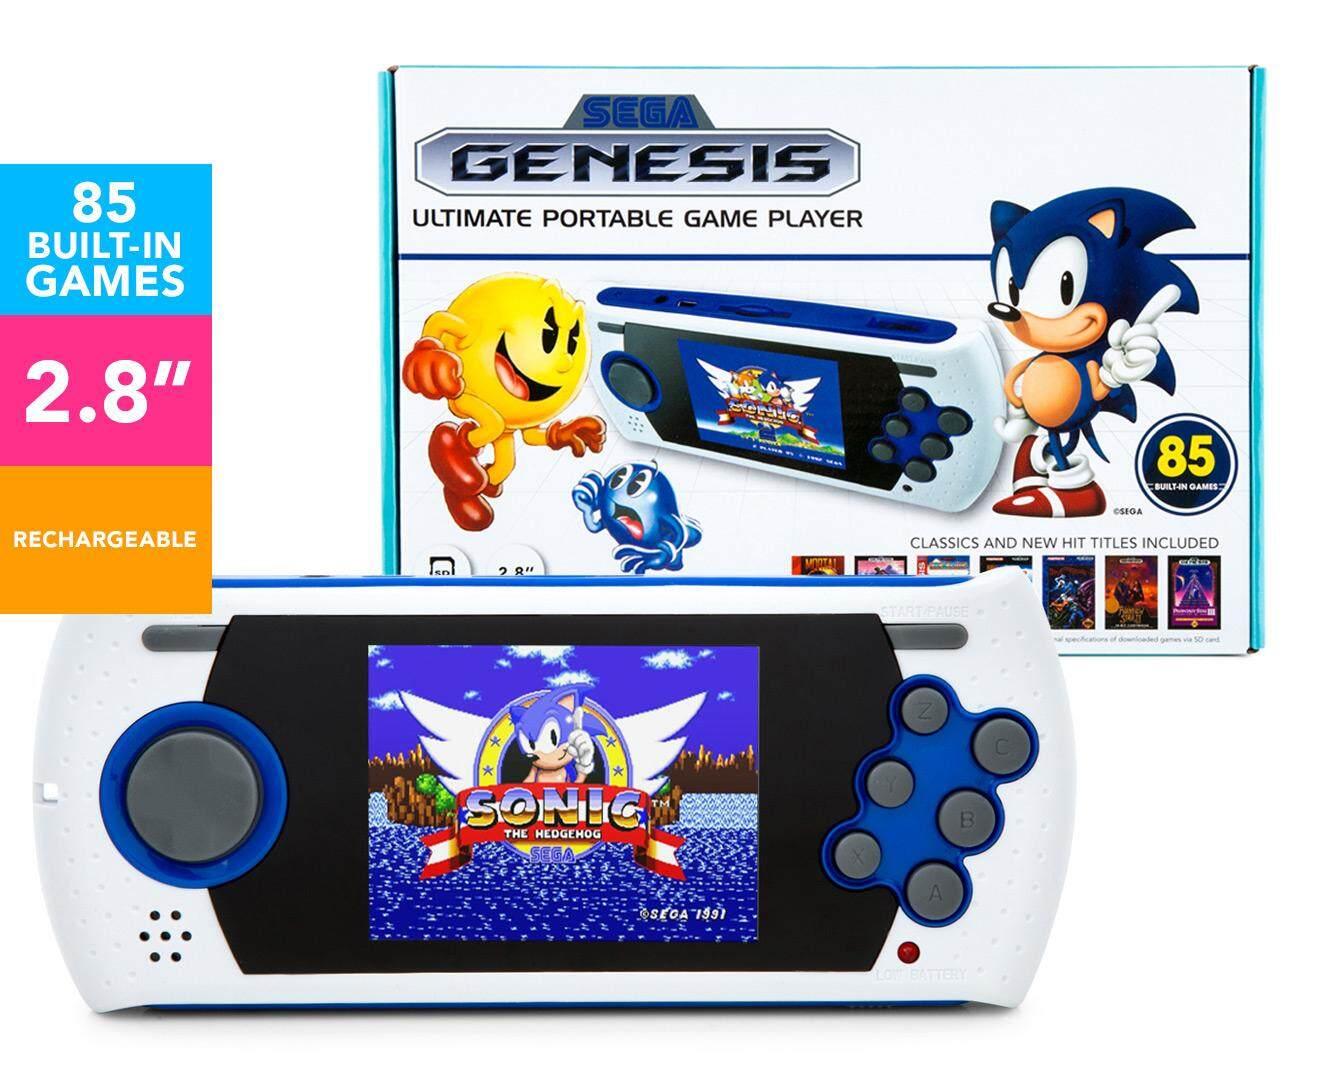 SEGA Ultimate Portable Game Player White/Blue/Black